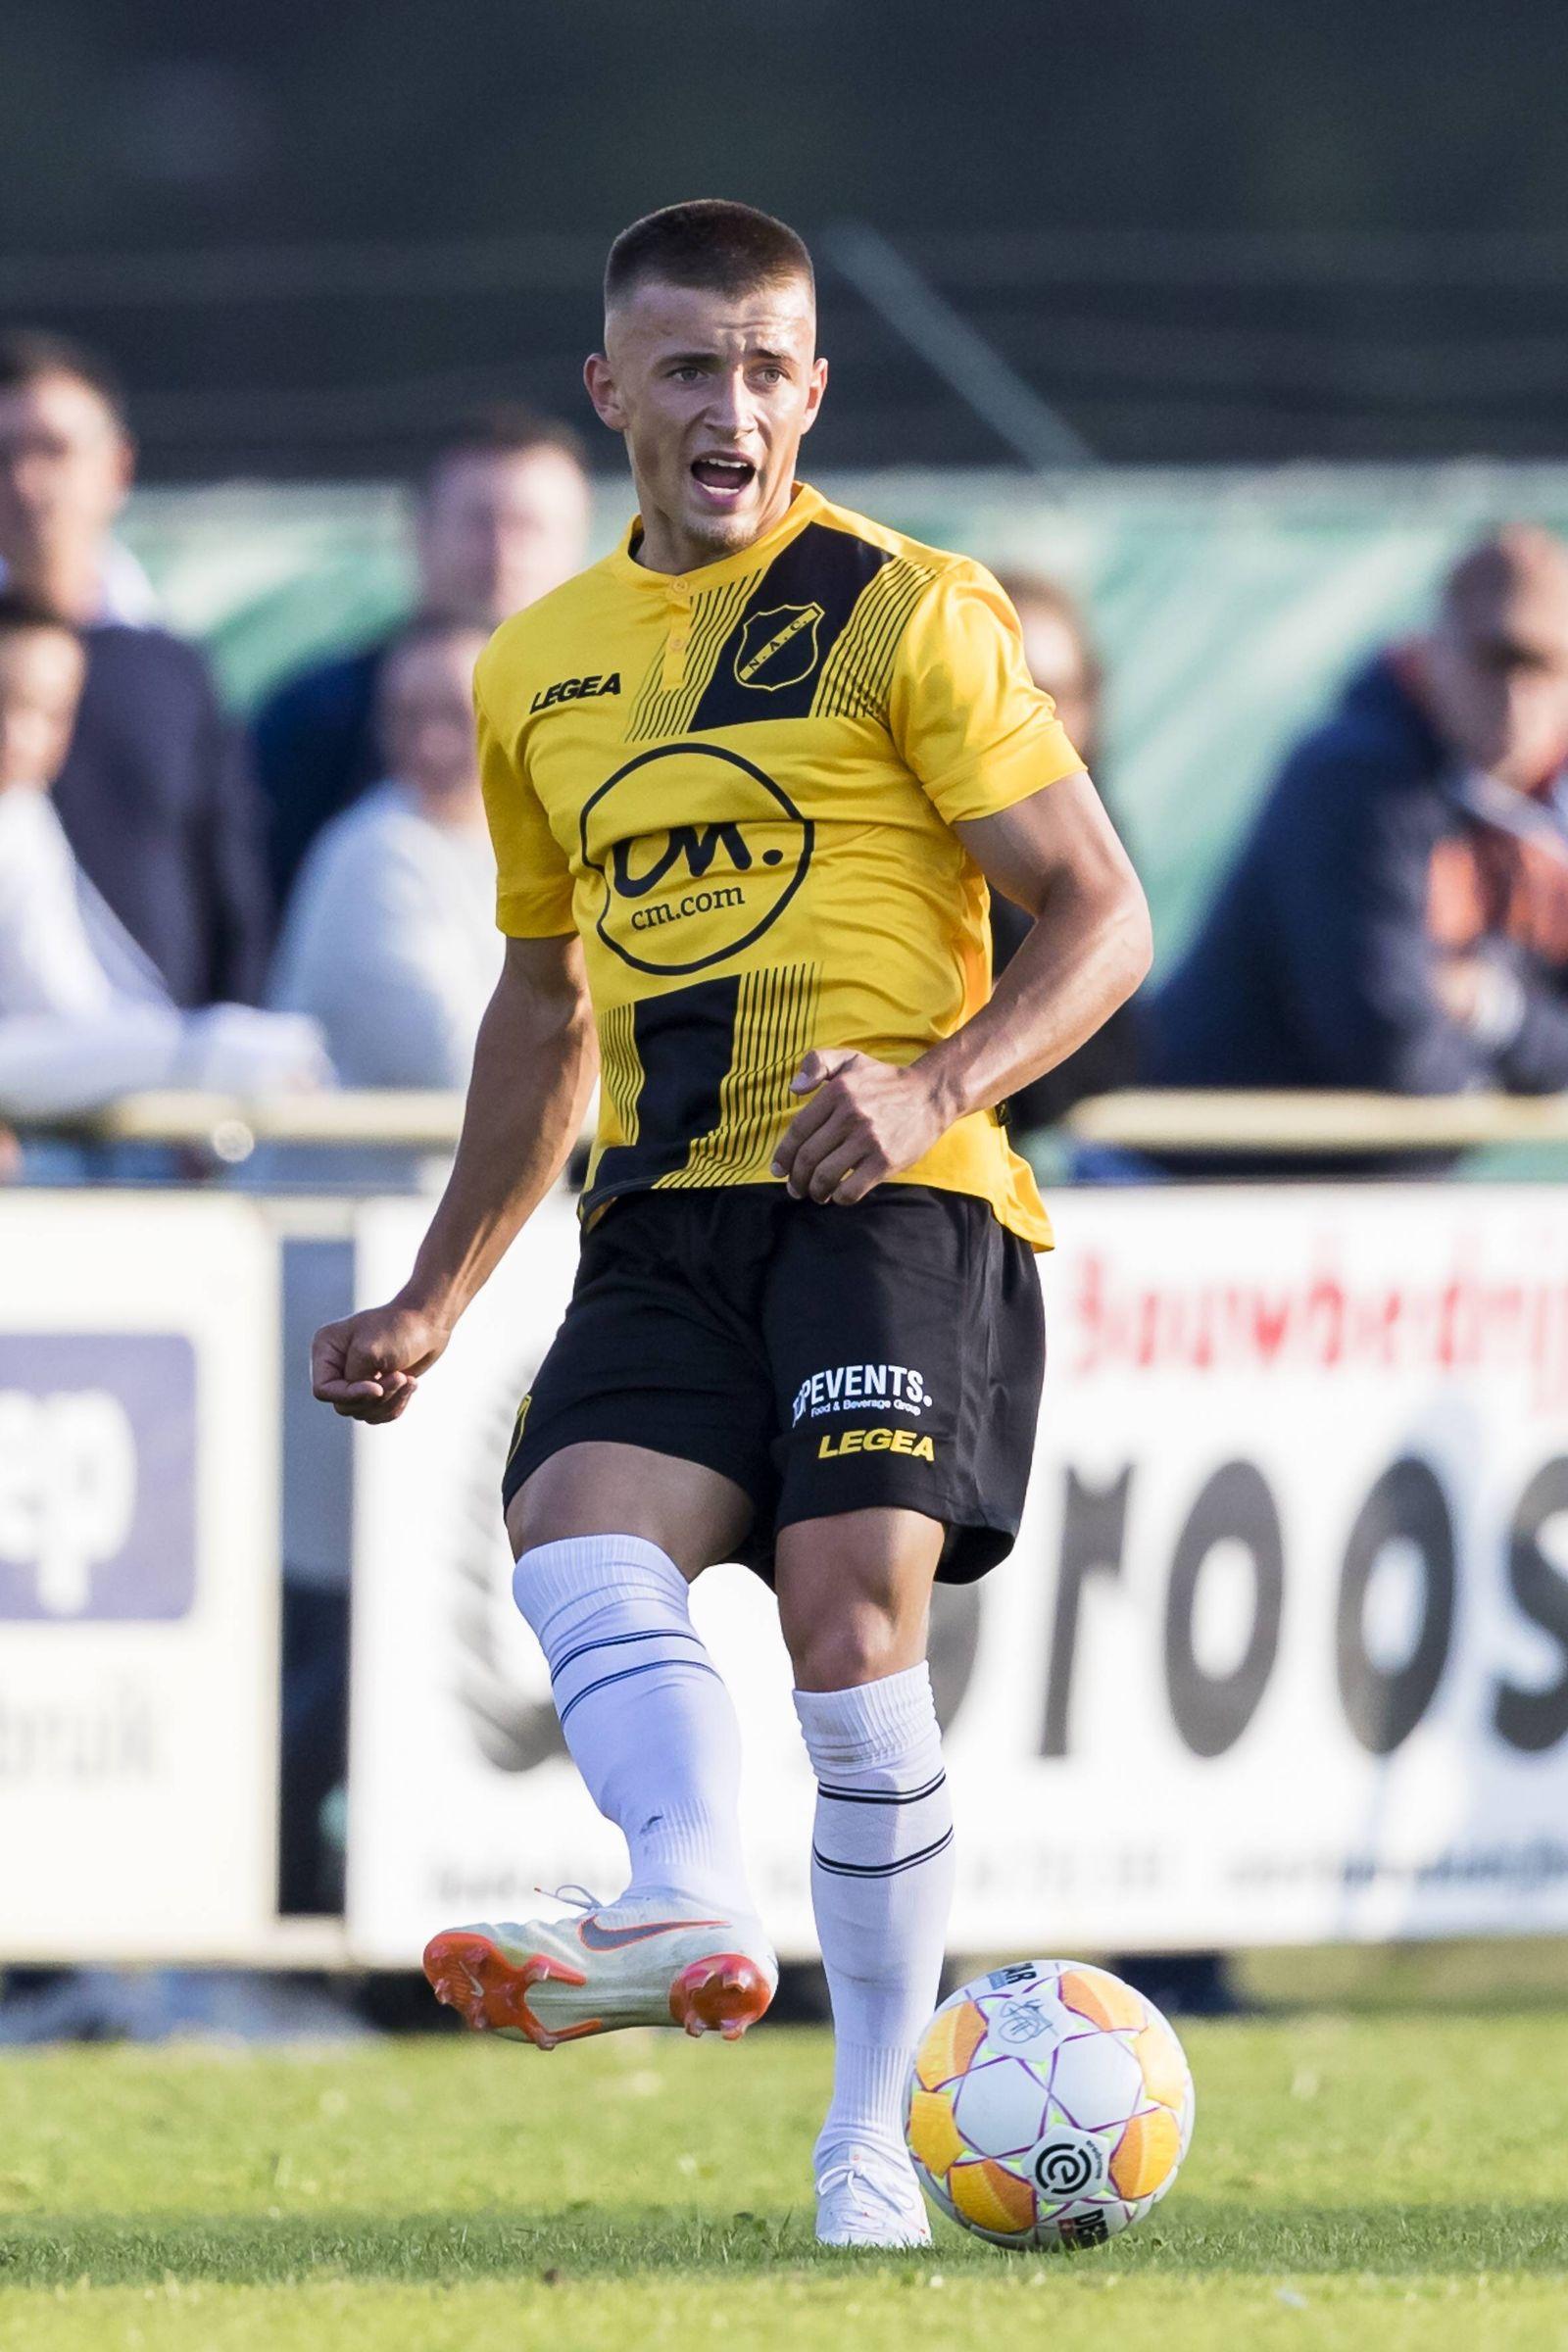 OUDENBOSCH 10 07 2018 soccer Dutch eredivisie season 2018 2019 NAC player Mike van Beijnen du